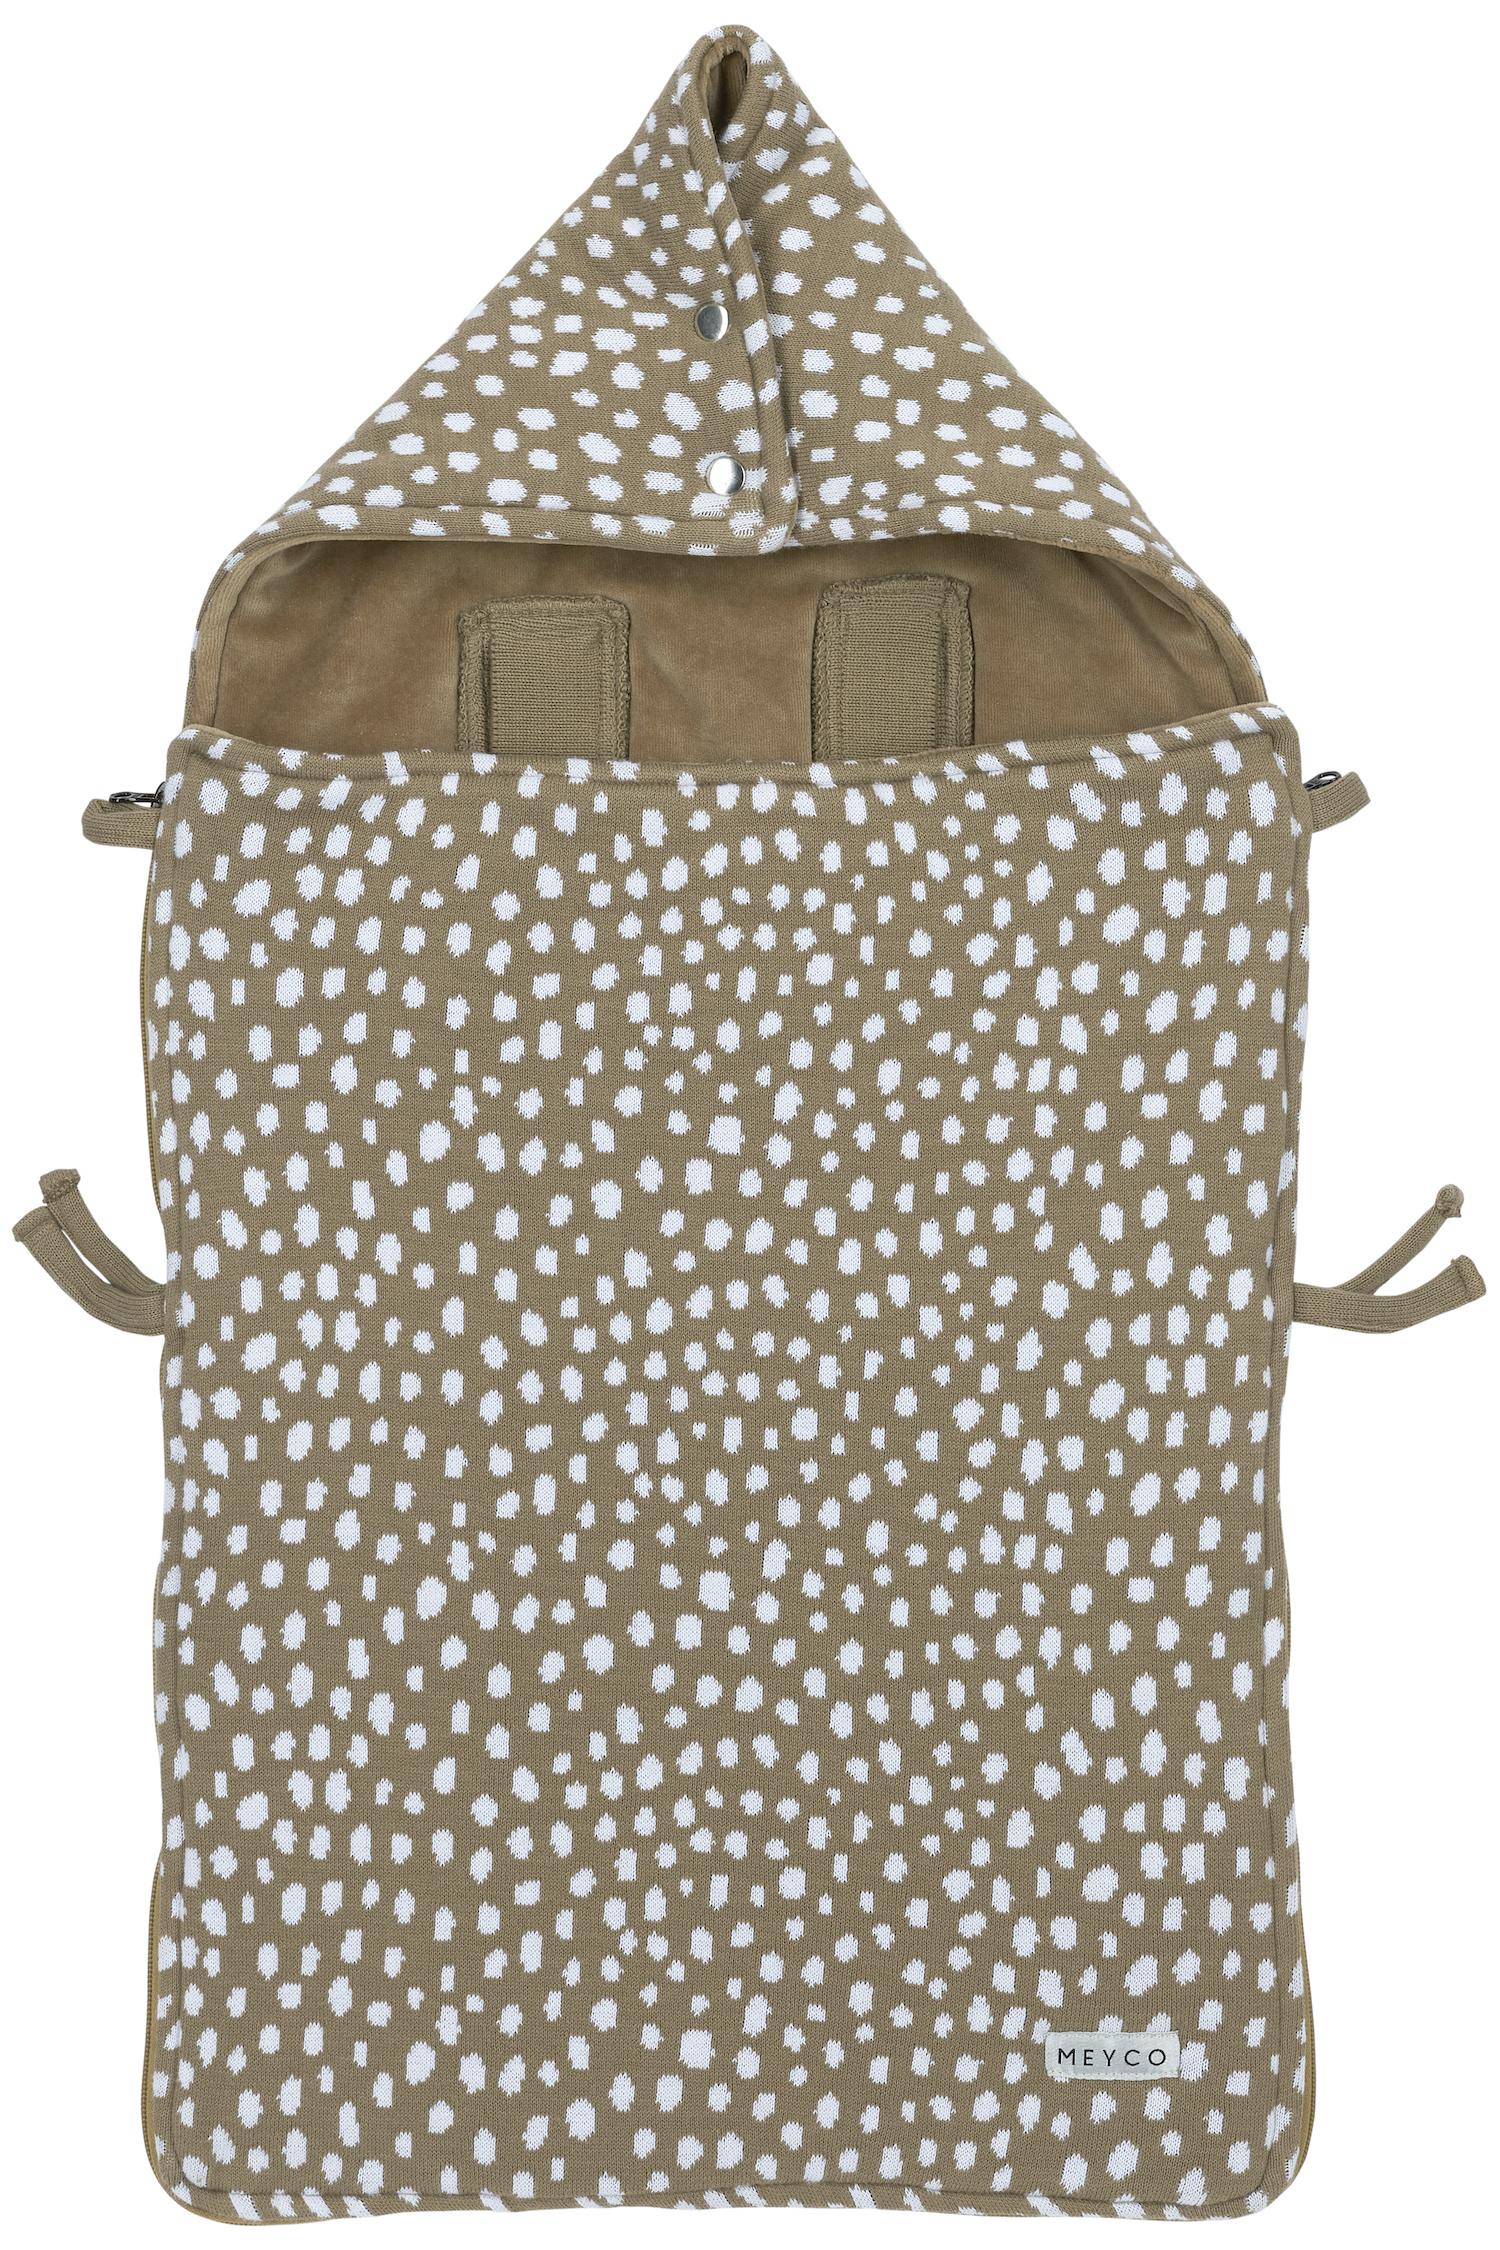 Fußsack Cheetah - Taupe - 40x82cm